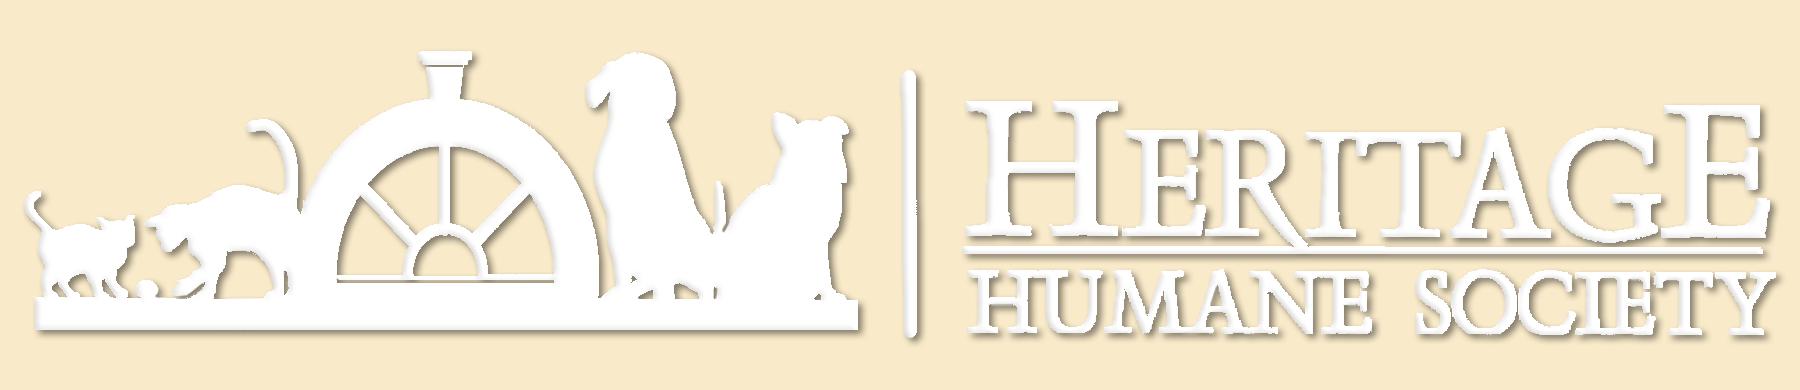 Heritrage Humane Society.png